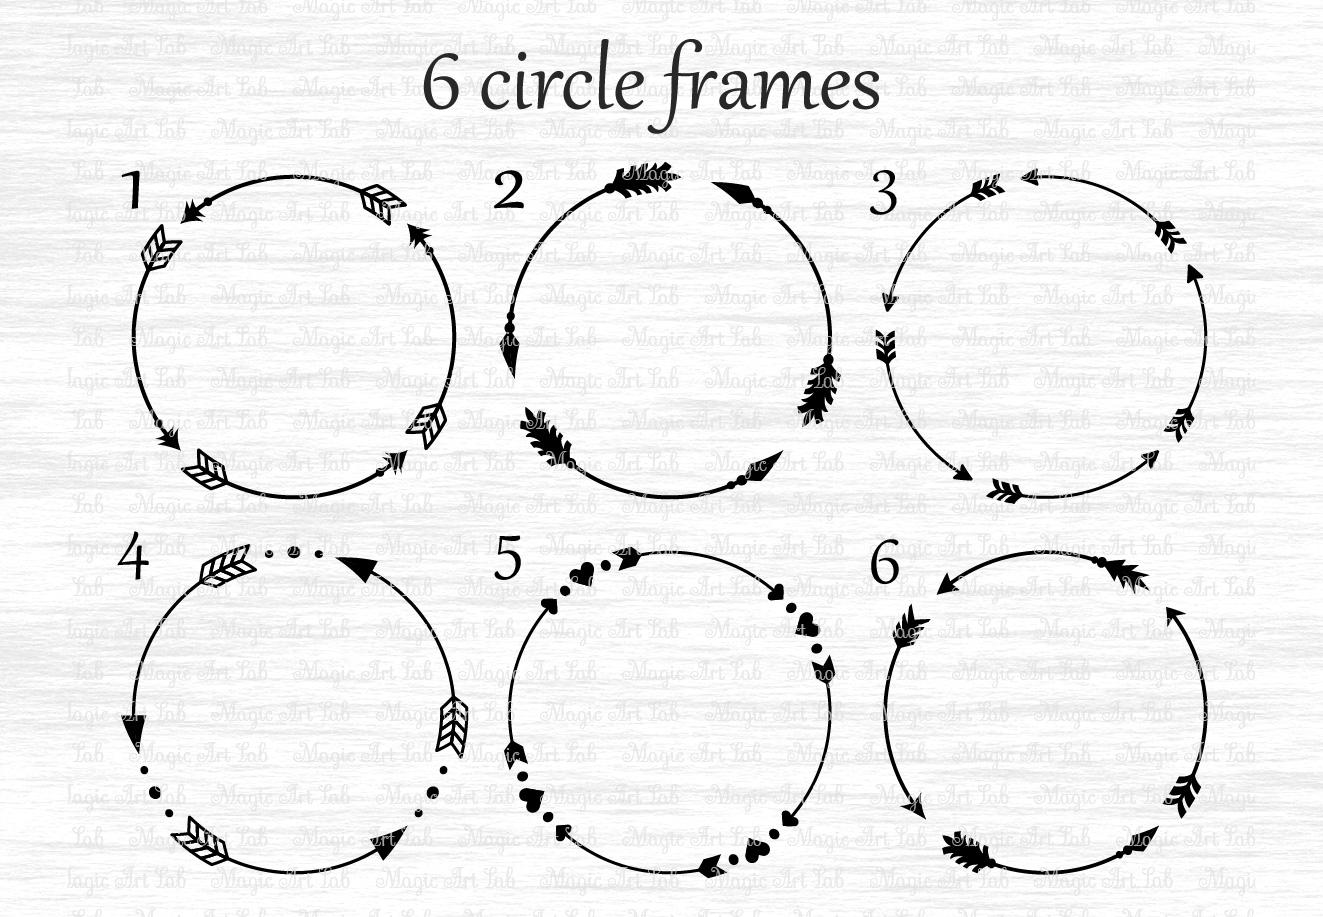 Arrows svg, Circle monogram svg, Circle frame arrow, Heart frame, Criss cross arrows, Tribal arrows svg, Boho arrows clipart, Ethnic aztec example image 5